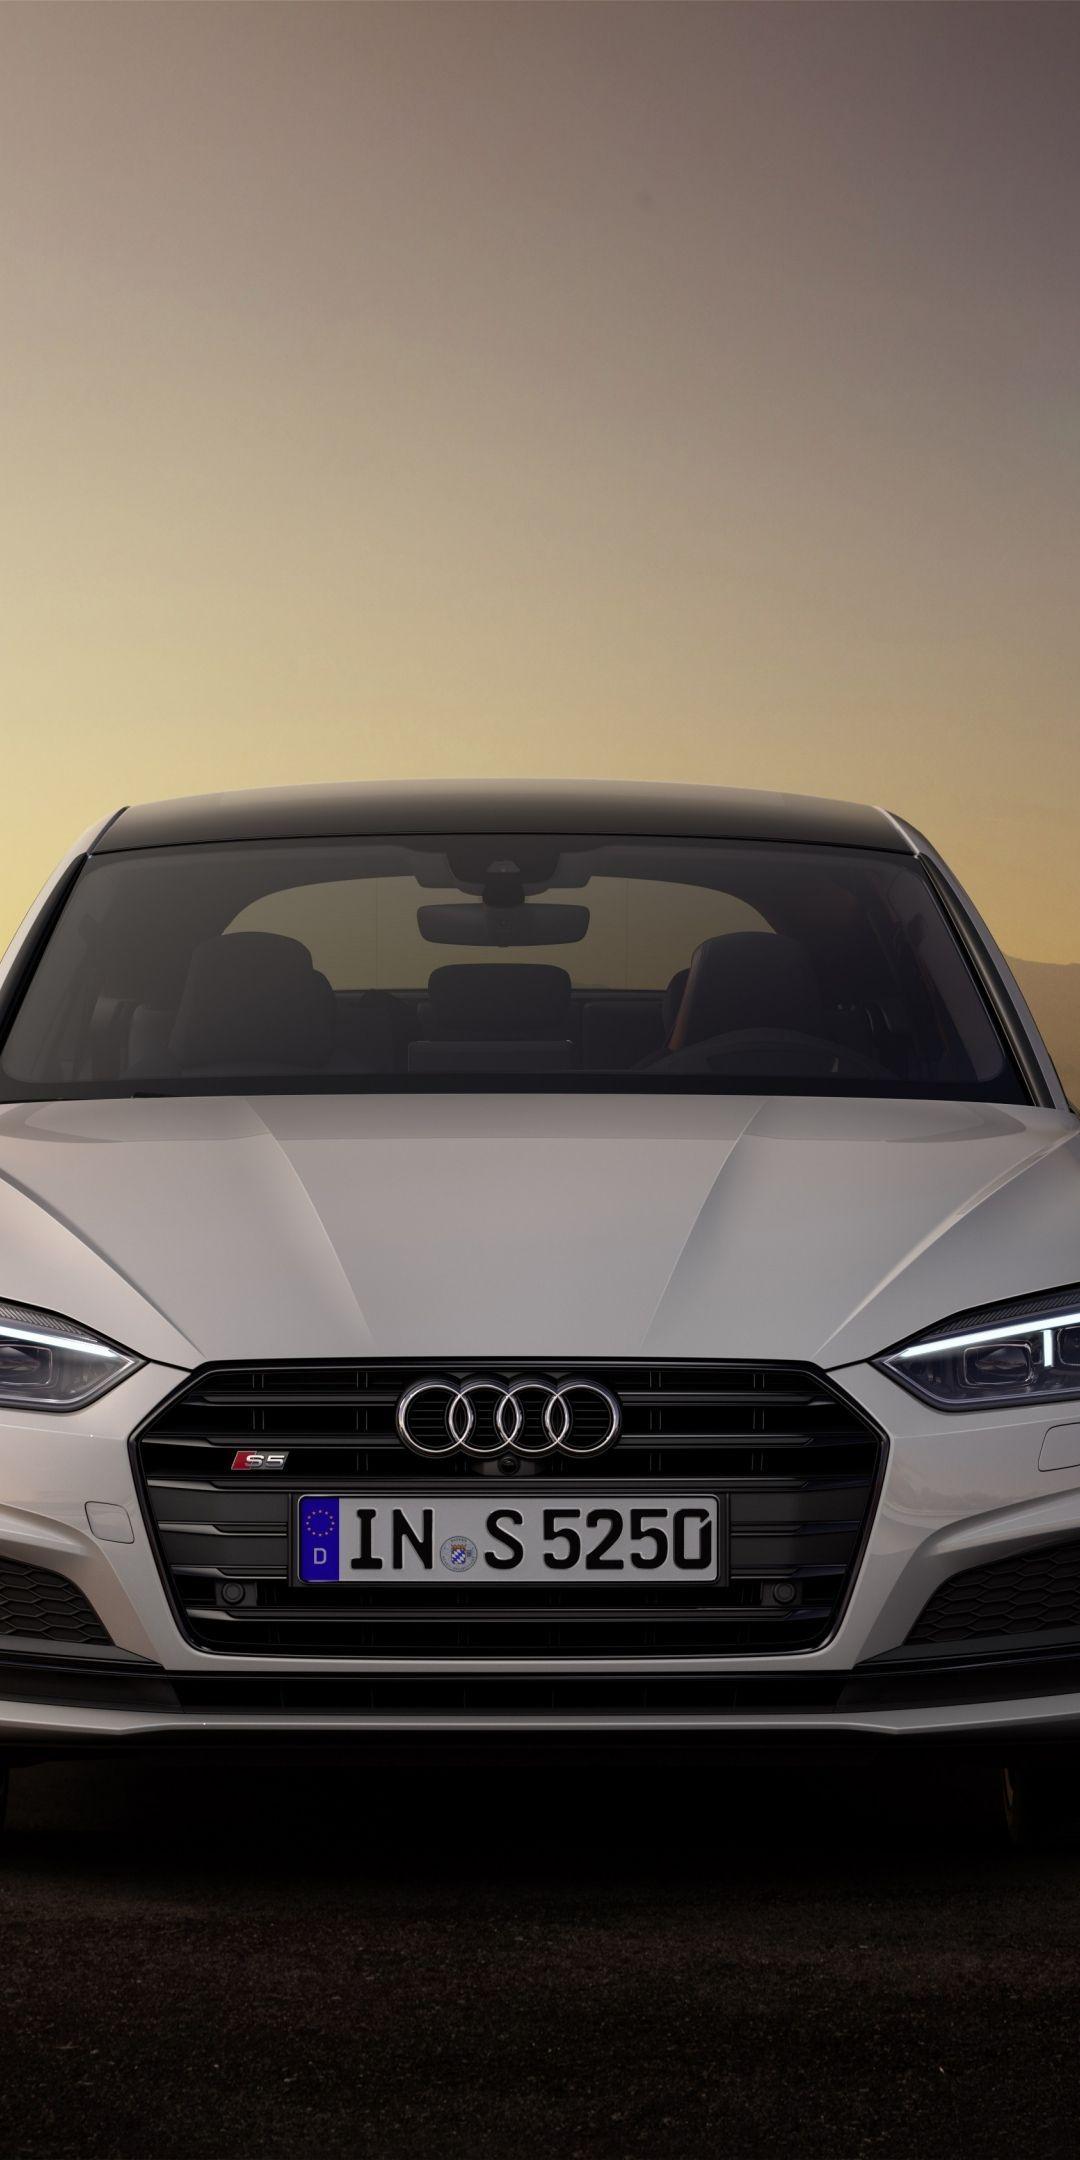 White Audi S5 Luxury Car 1080x2160 Wallpaper Luxury Cars Audi White Audi Audi S5